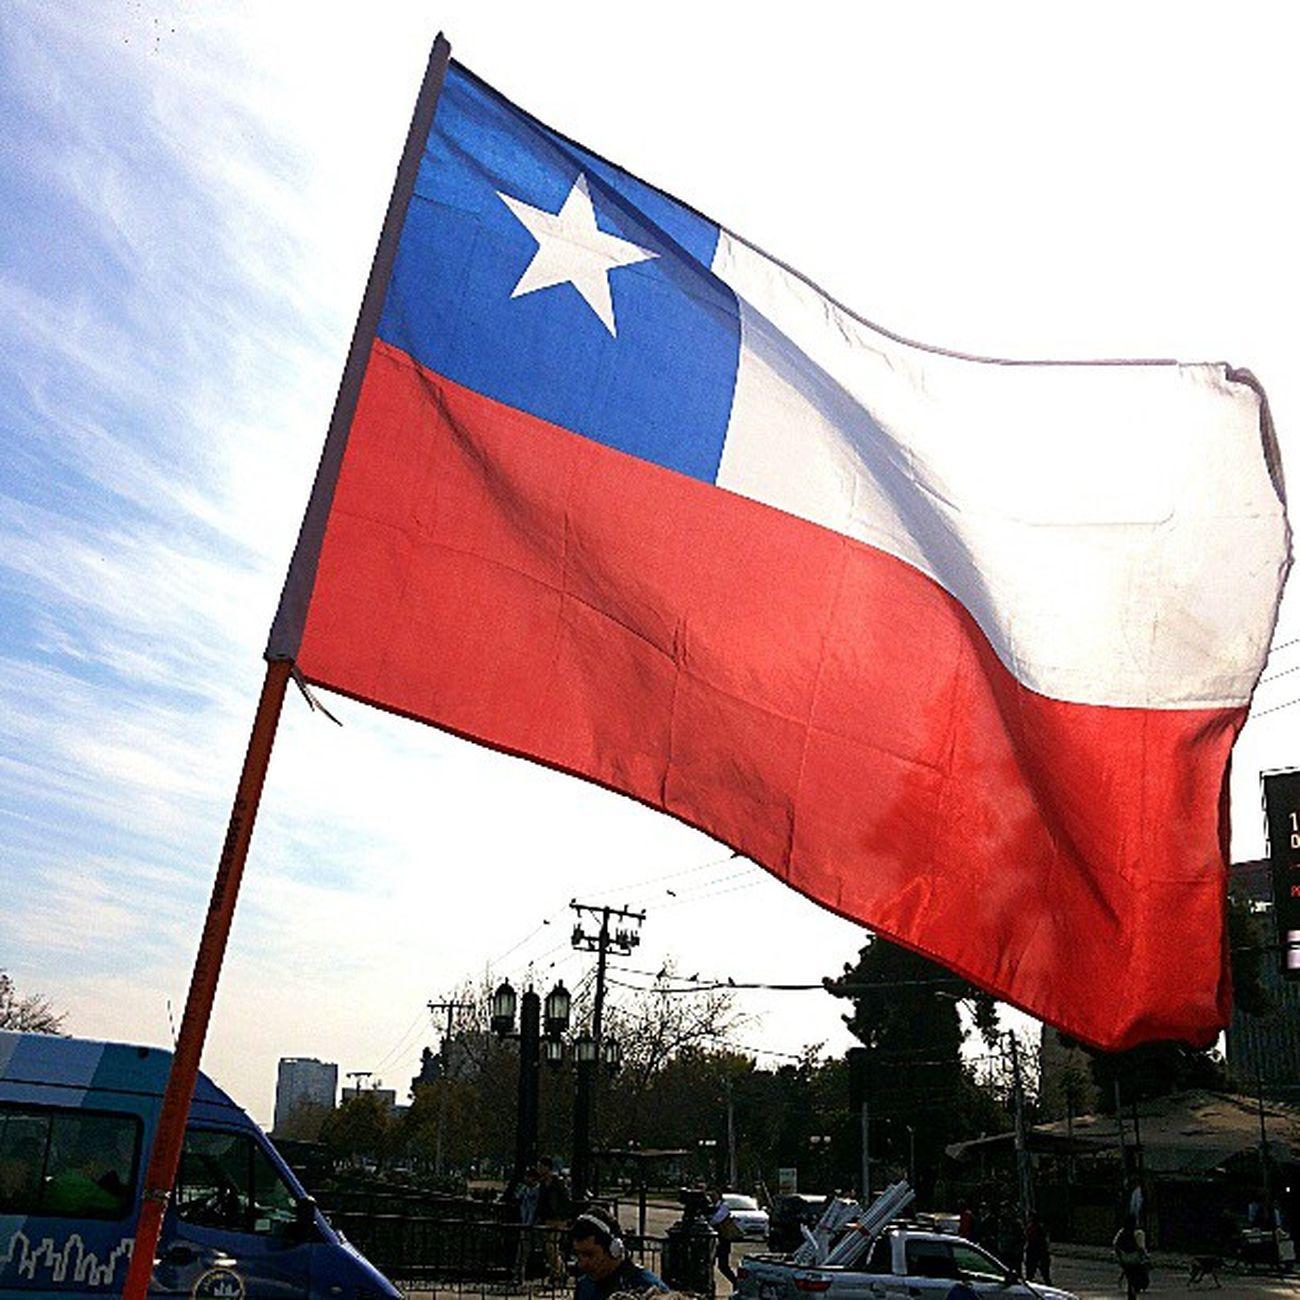 Flag Bandera Chilena Chile Puente PioNono like4like InstaChile InstaGram Instarecord FollowBack LikeNow Like1000 InstaGay Gay Free Instafriends